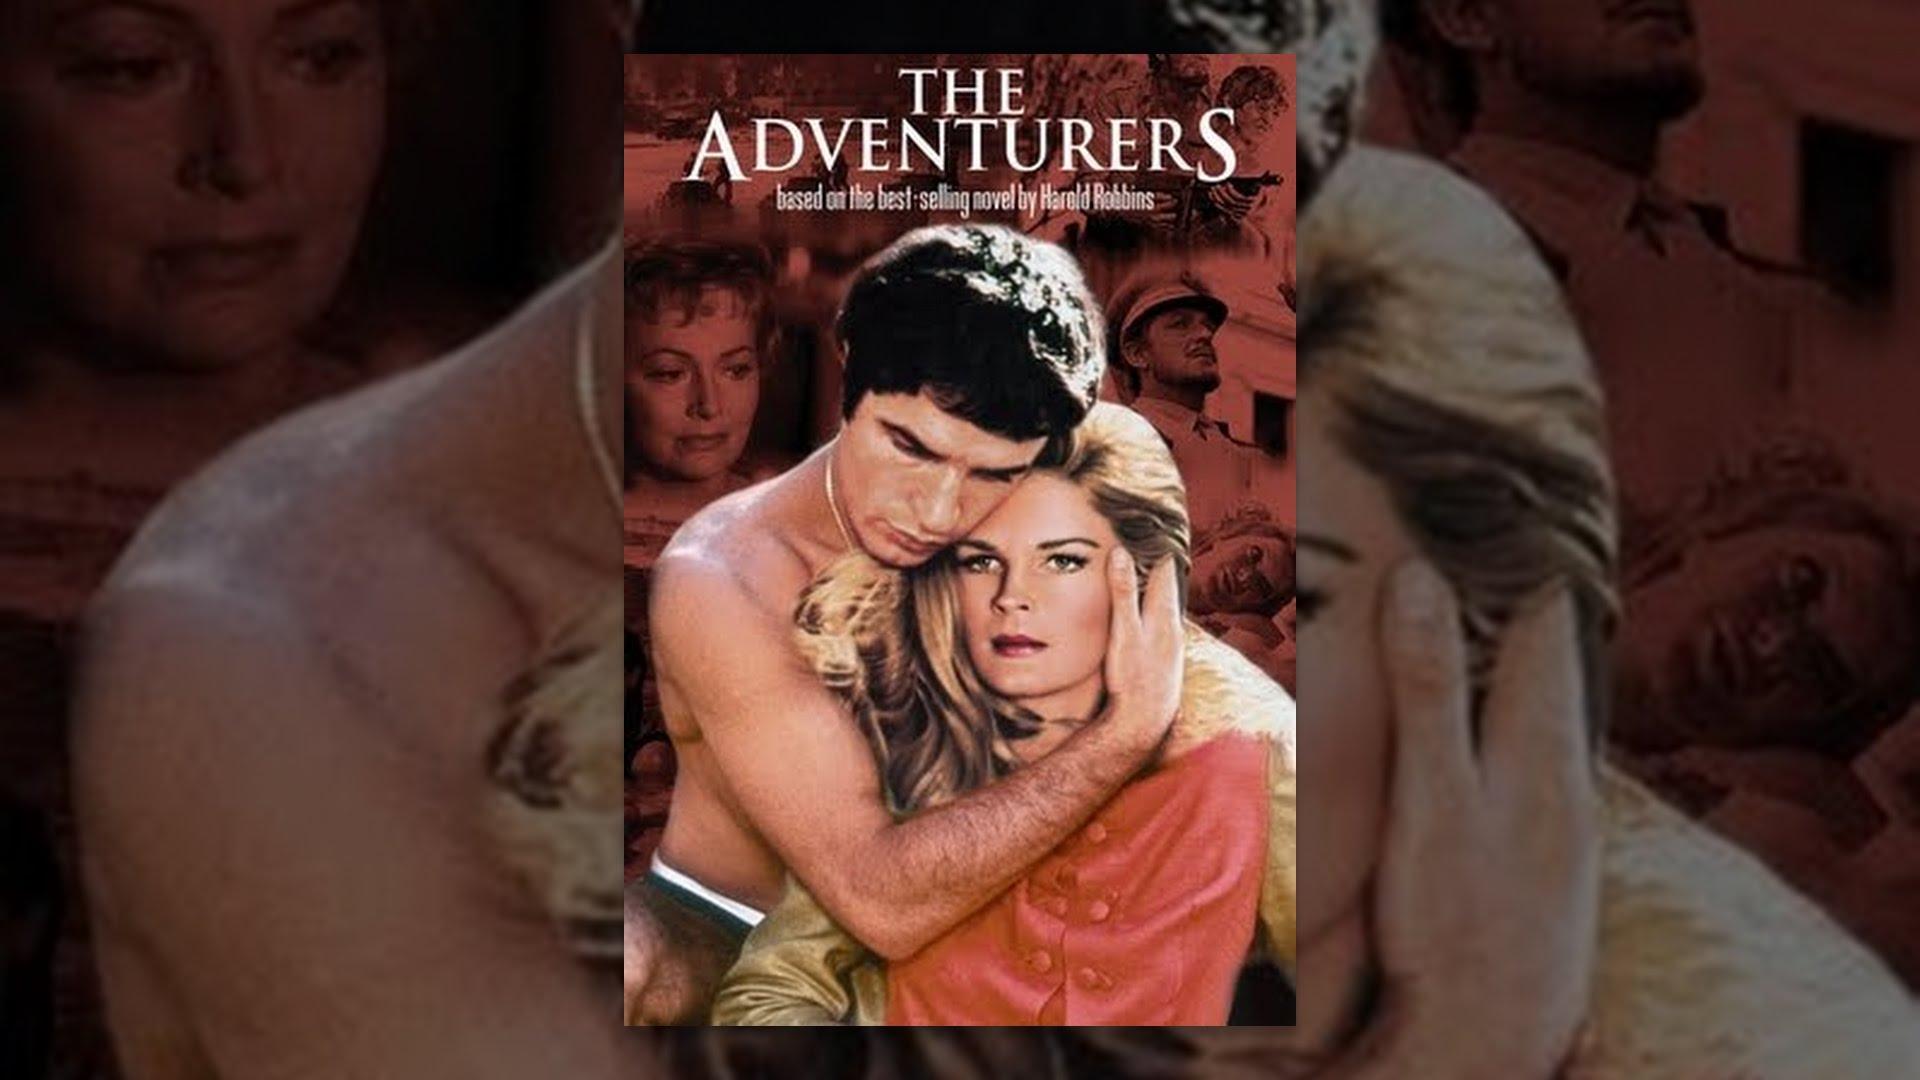 The Adventurers YouTube